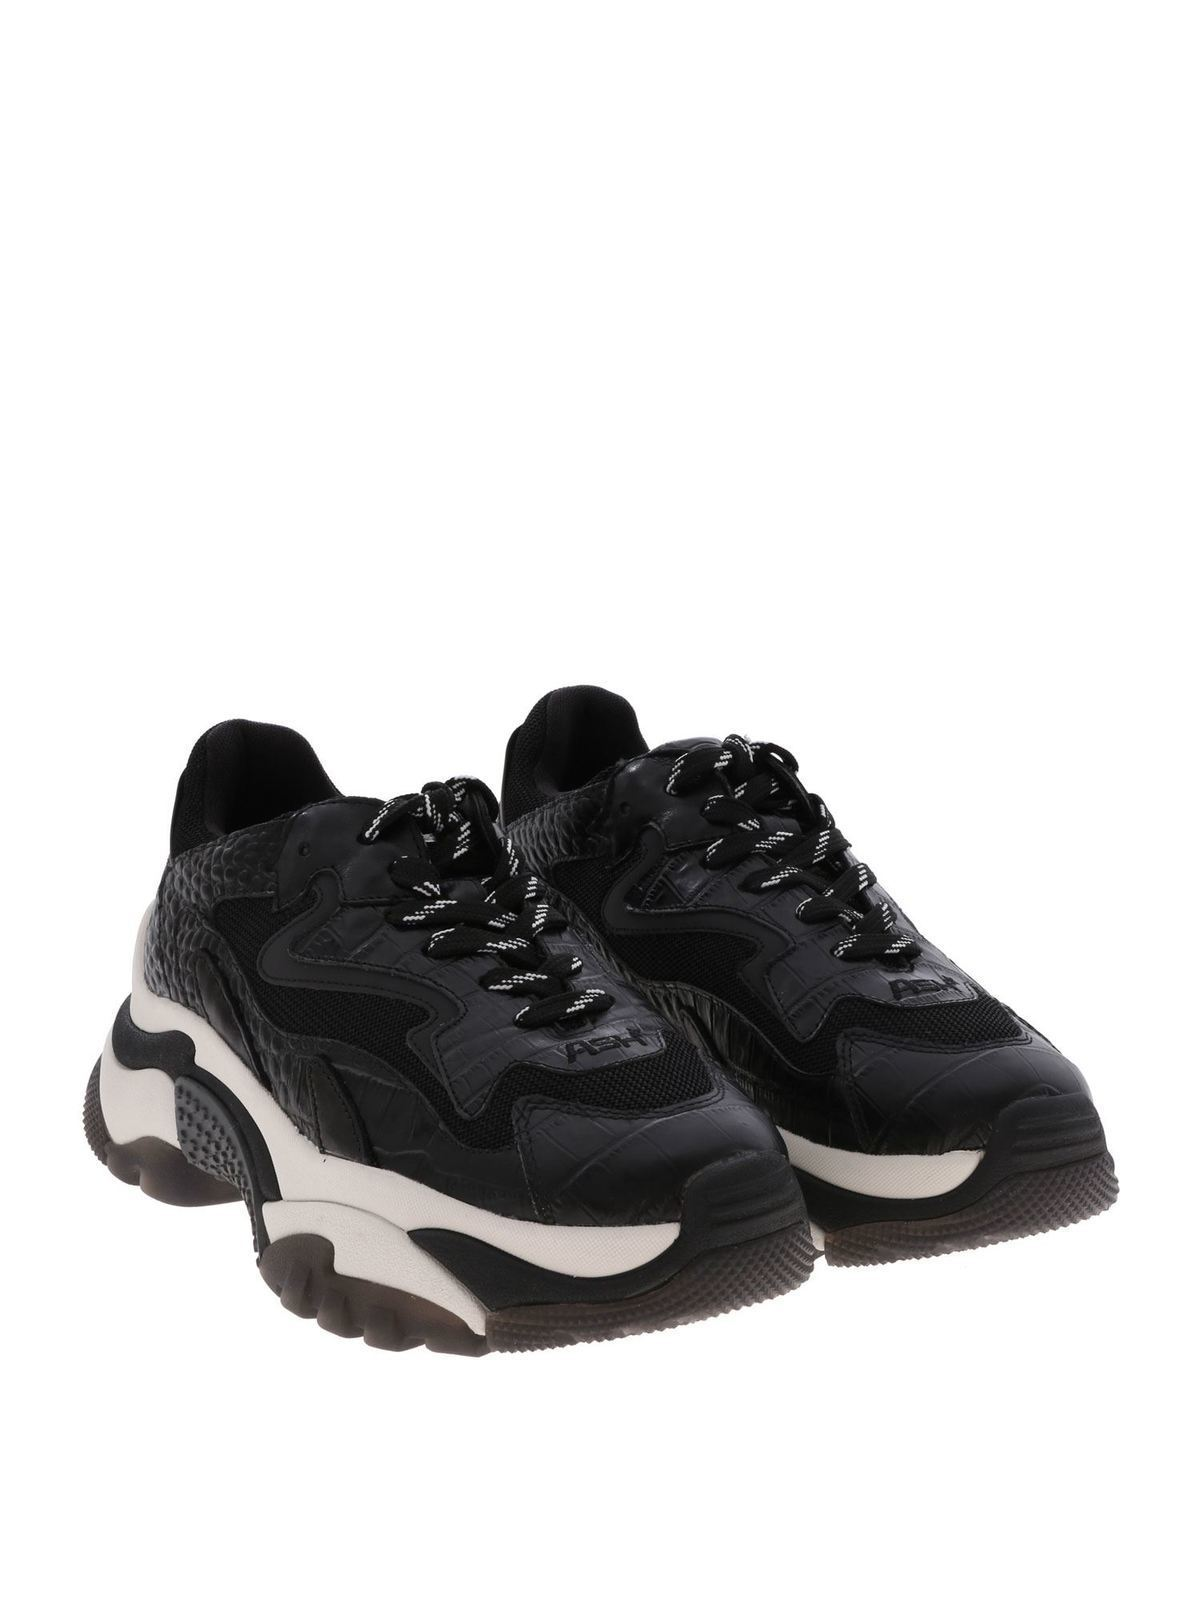 Ash - Addict sneakers in black - اسپرت